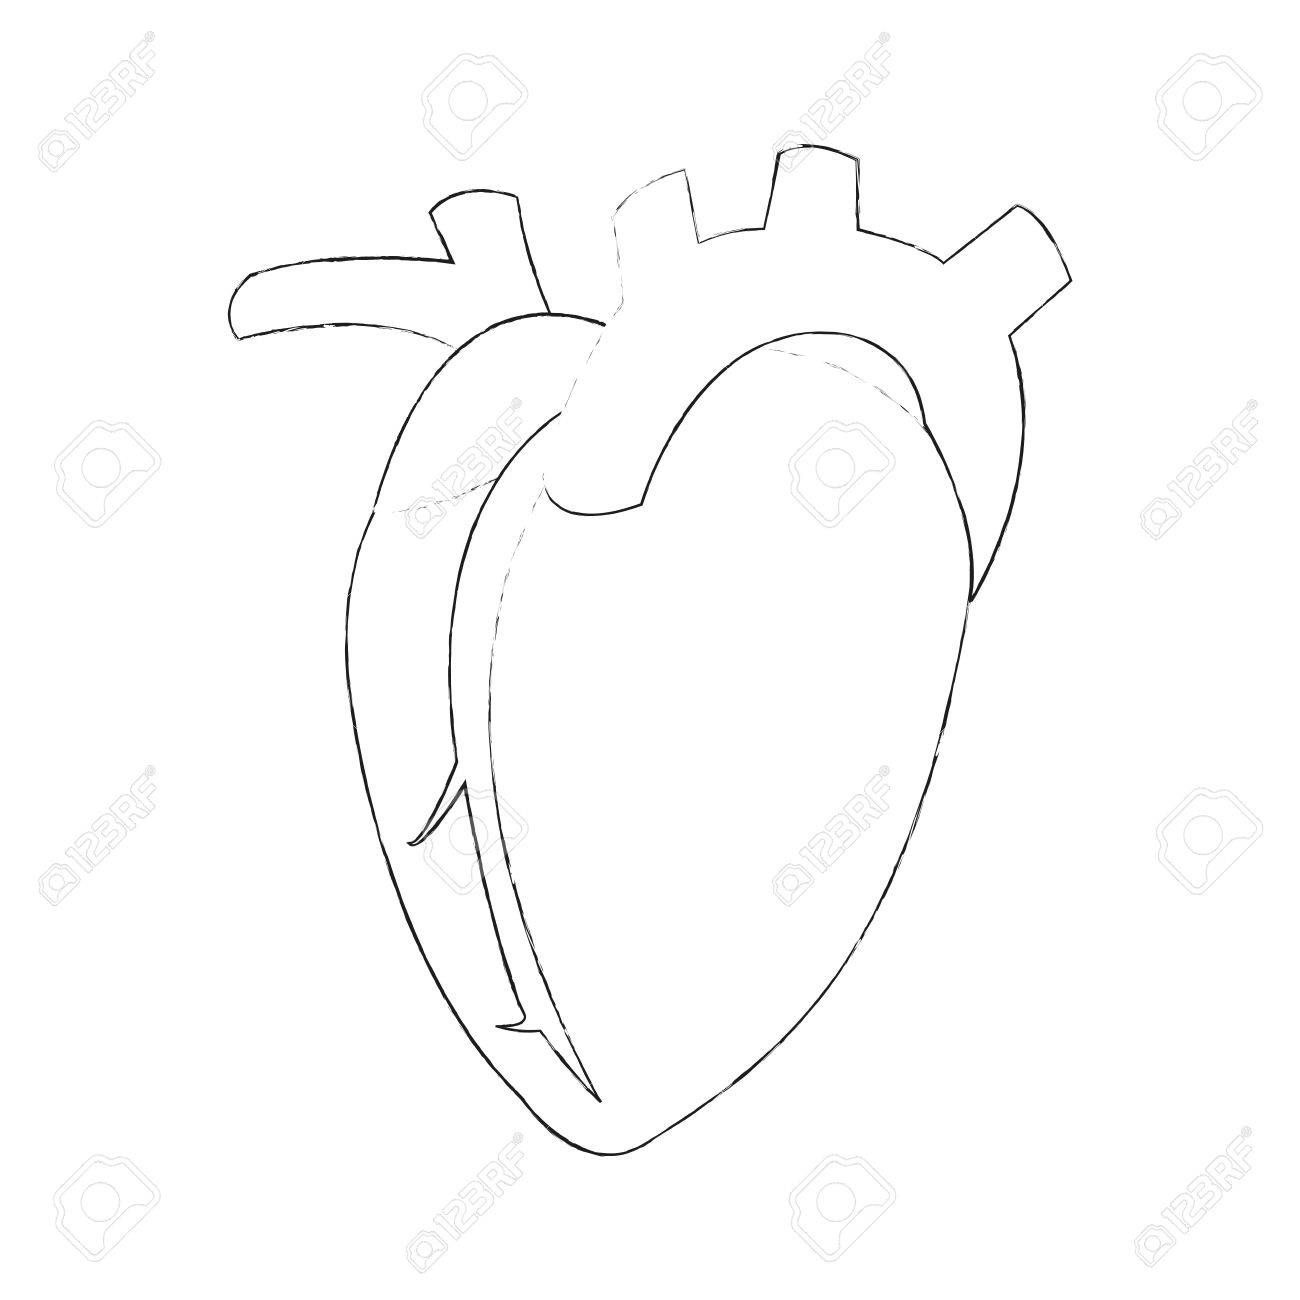 1300x1300 Human Heart Icon Image Vector Illustration Design Simple Sketch